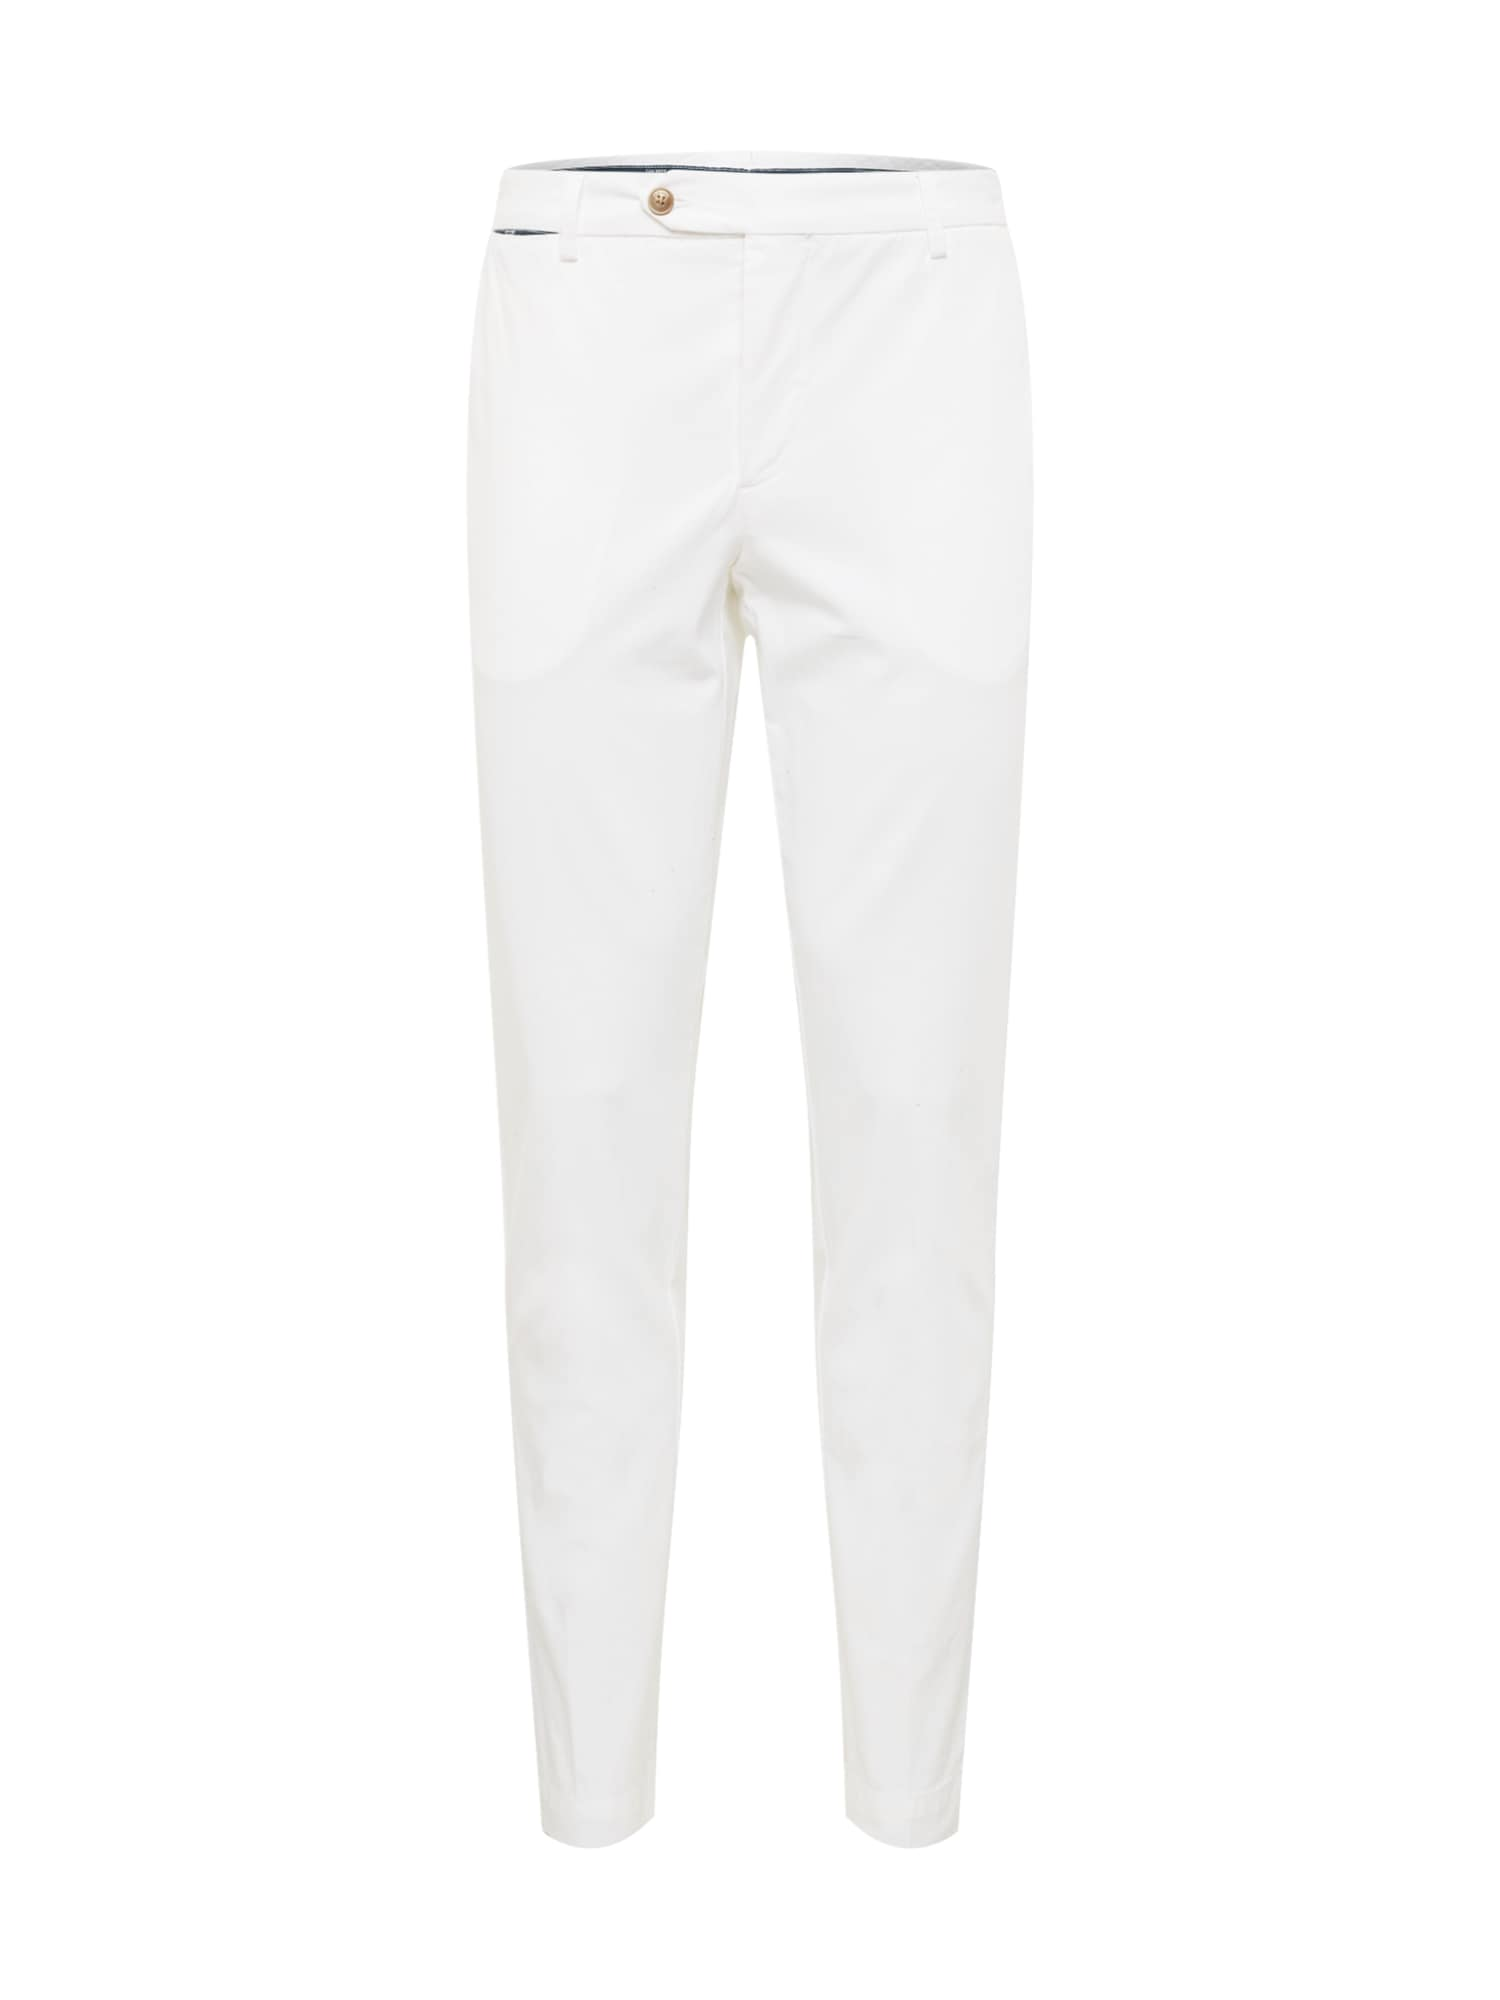 "Hackett London ""Chino"" stiliaus kelnės 'KENSINGTON' balta"